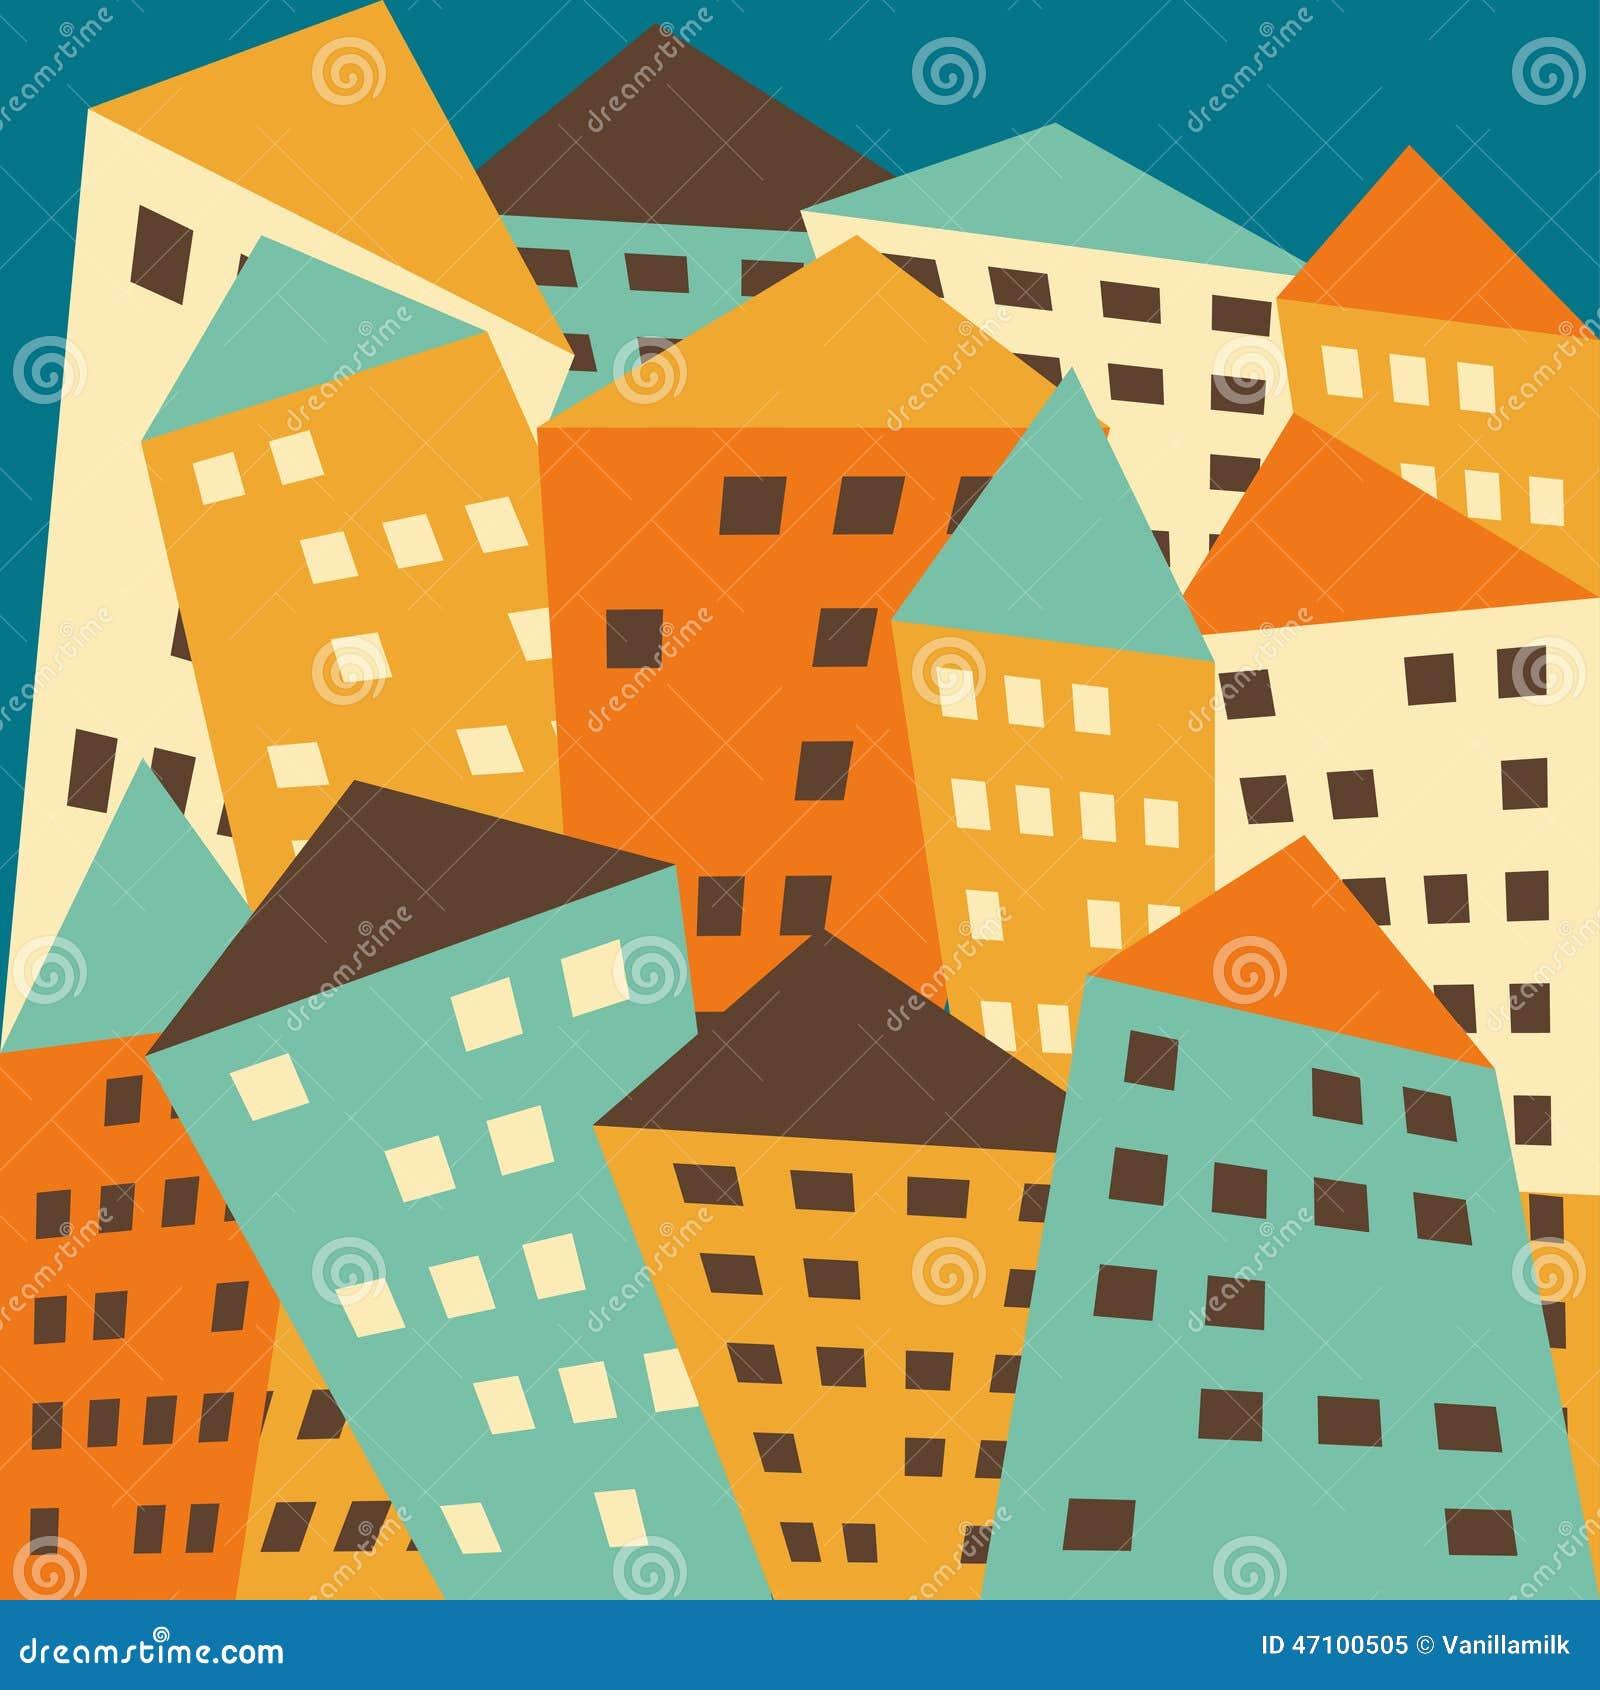 Helle farbige fiktive verzerrte Häuser des Vektors